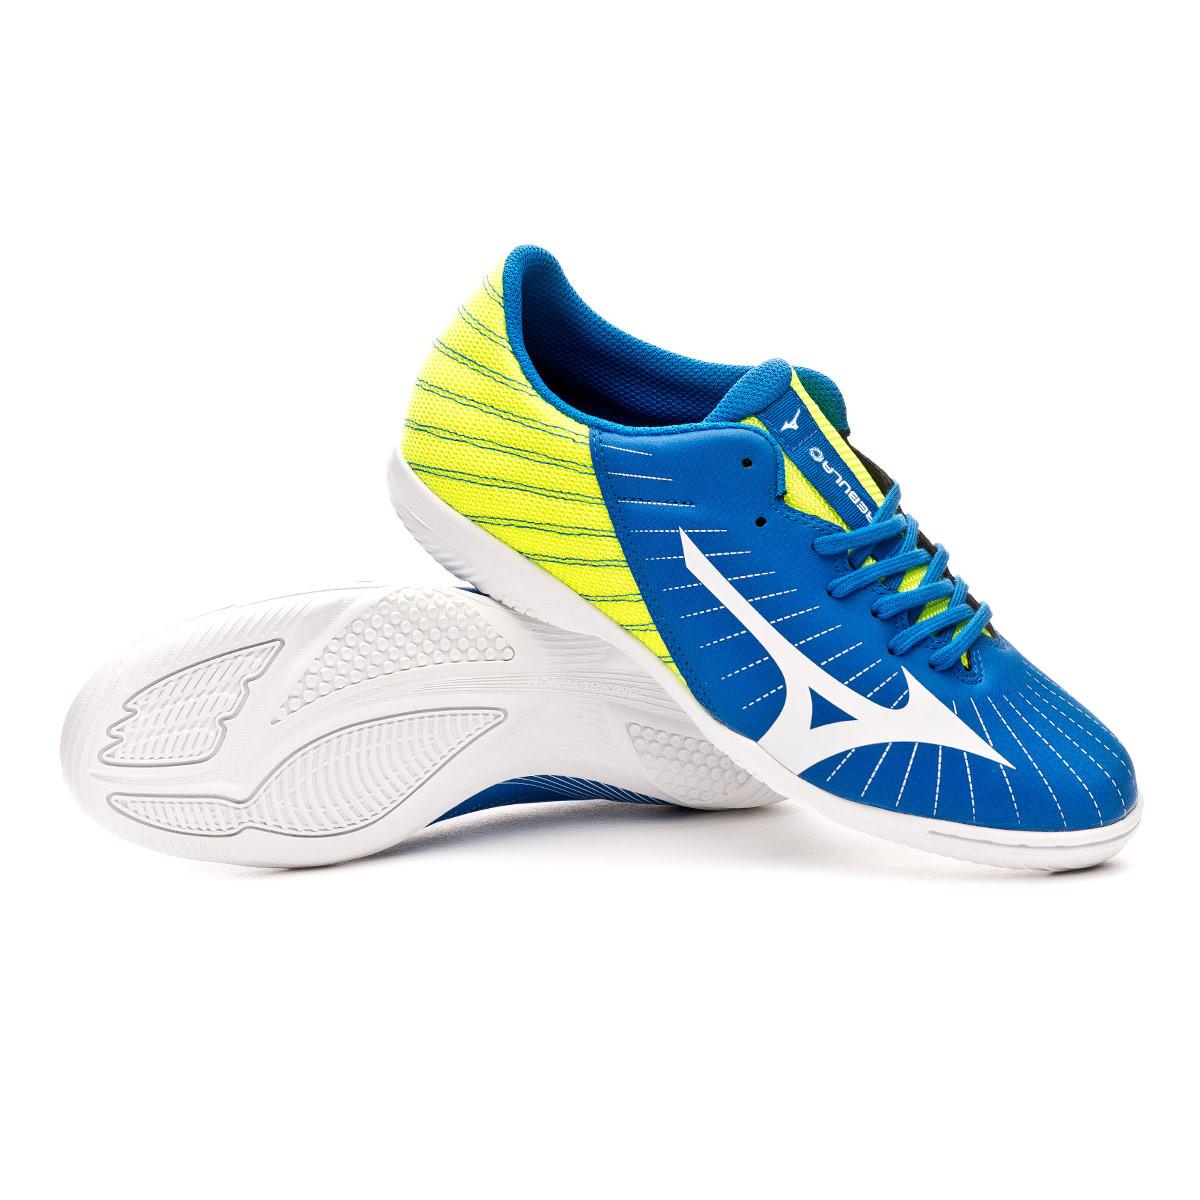 mizuno womens volleyball shoes size 8 x 4 high ground orlando